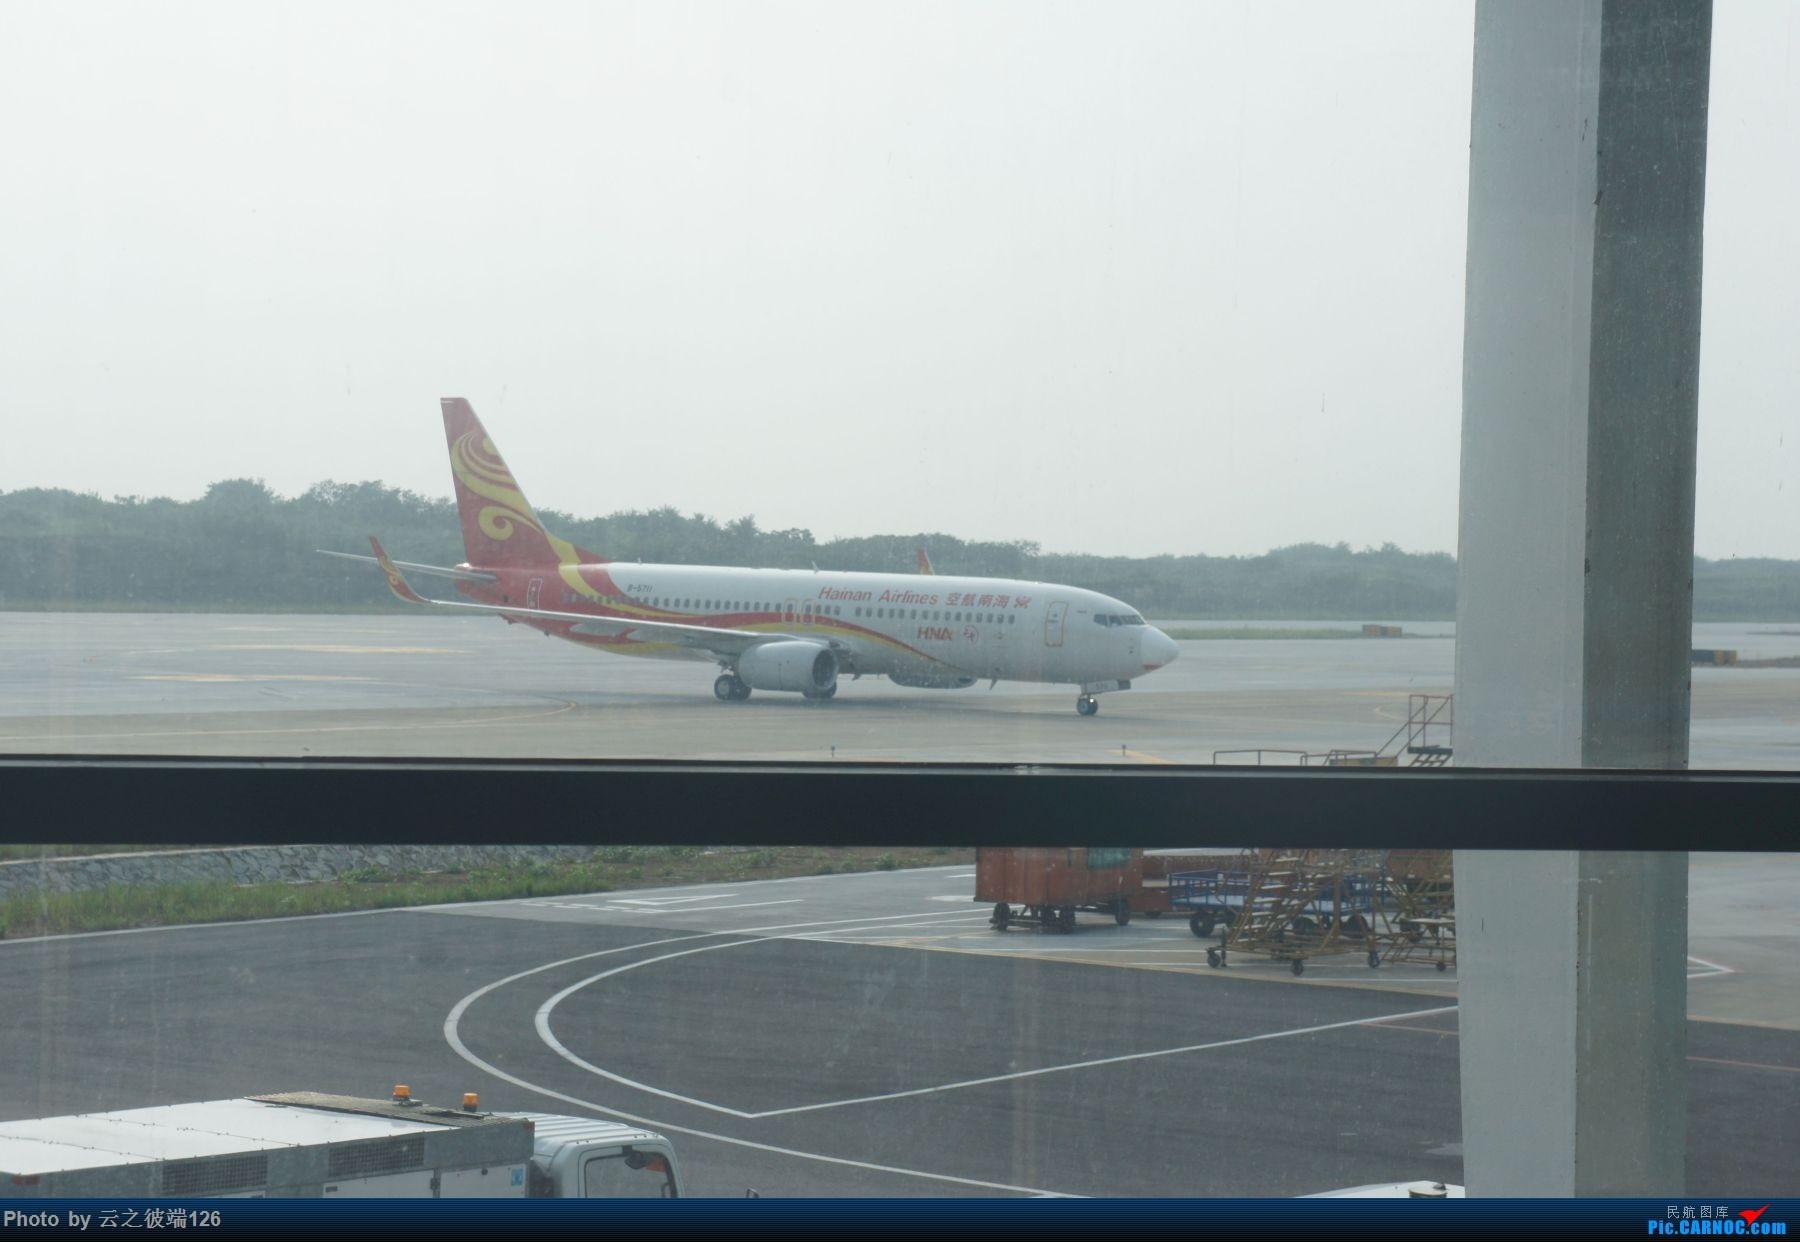 Re:[原创]迟到两年的游记 -----------NKG-SZX-NKG ZH+白菜航------ BOEING 737-800 B-5711 中国南京禄口国际机场